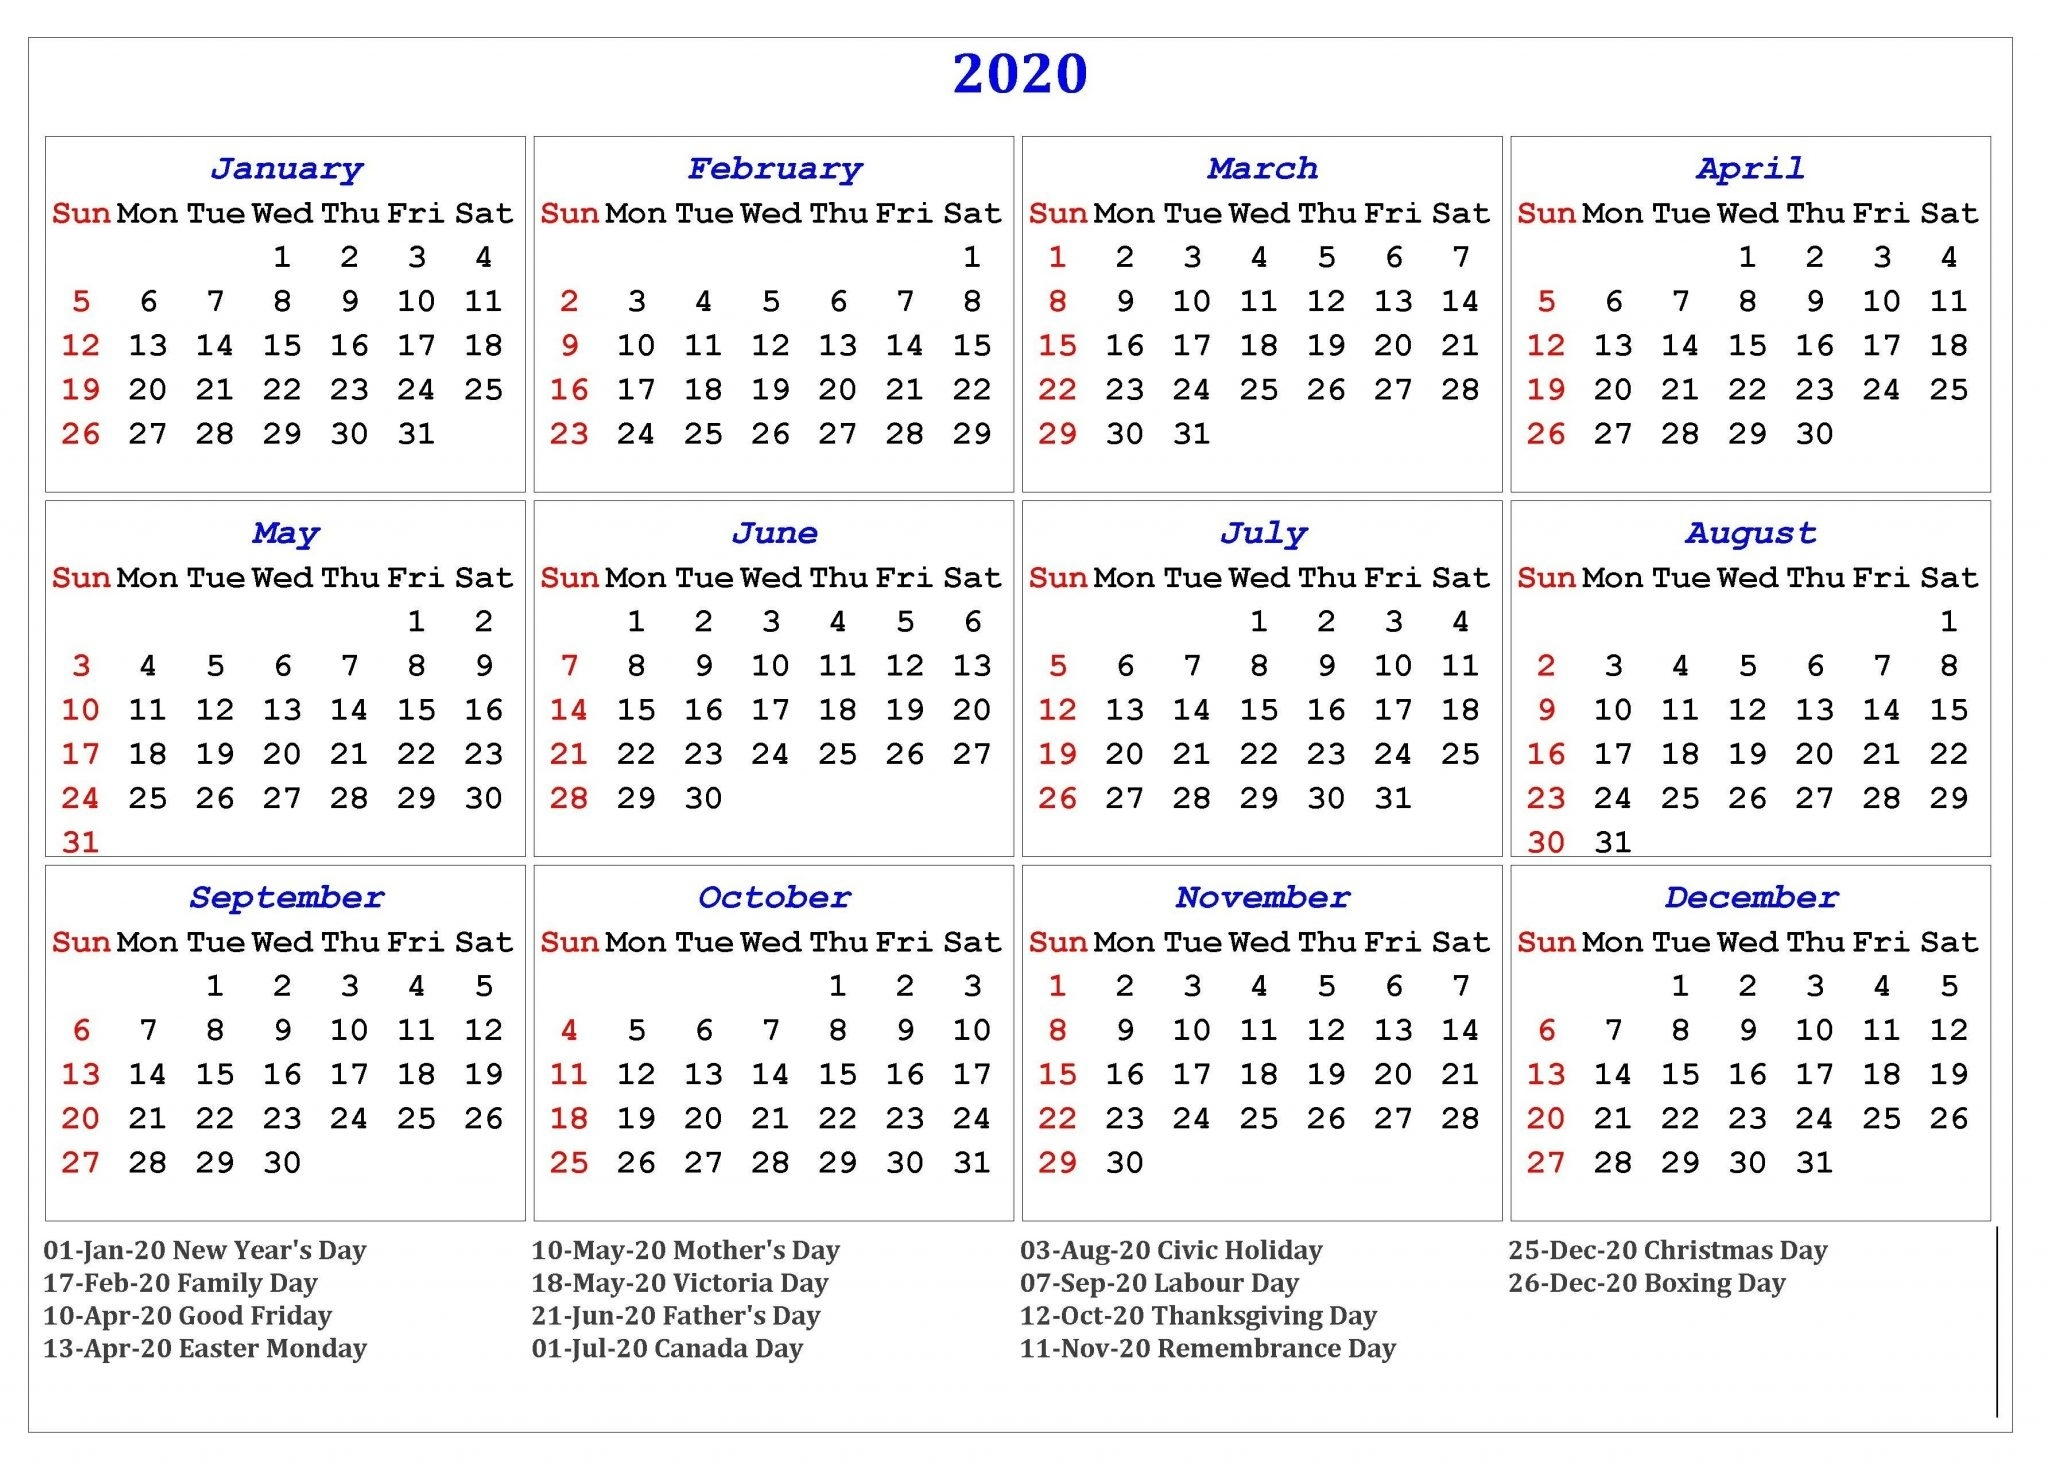 2020 One Page Holidays Calendar - Free Printable Calendar